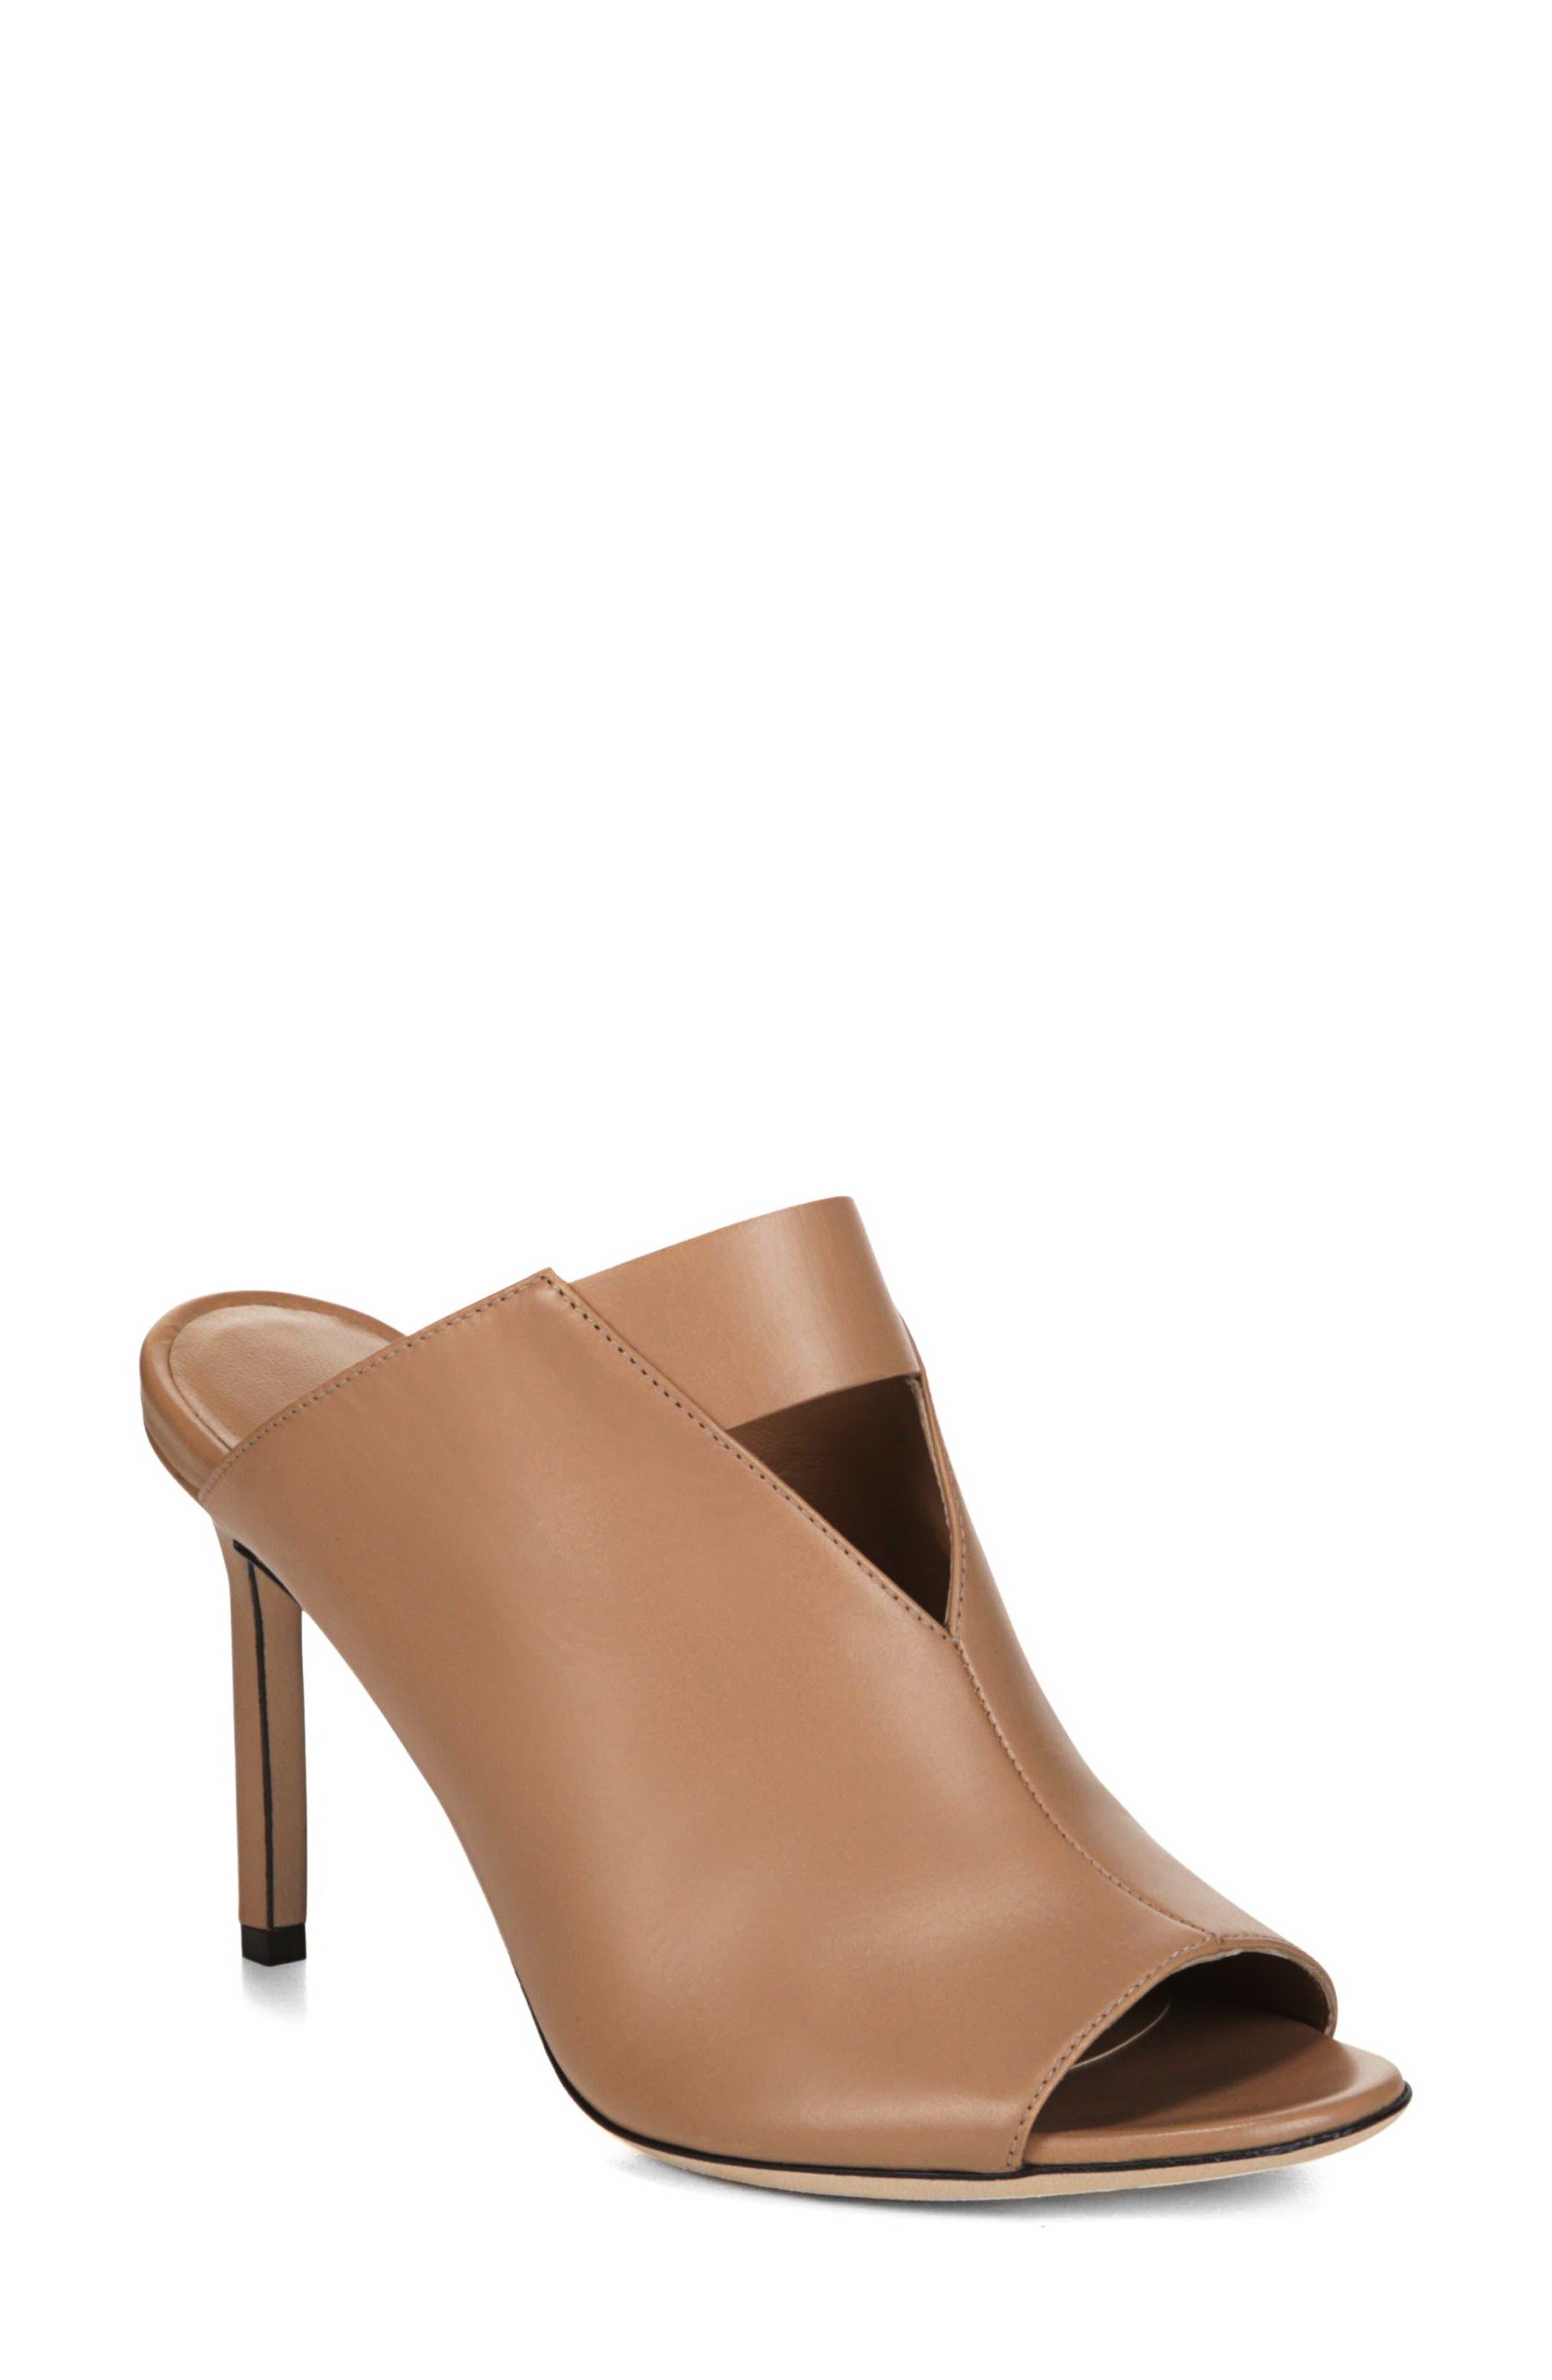 Mira Sandal,                             Main thumbnail 1, color,                             Desert Leather